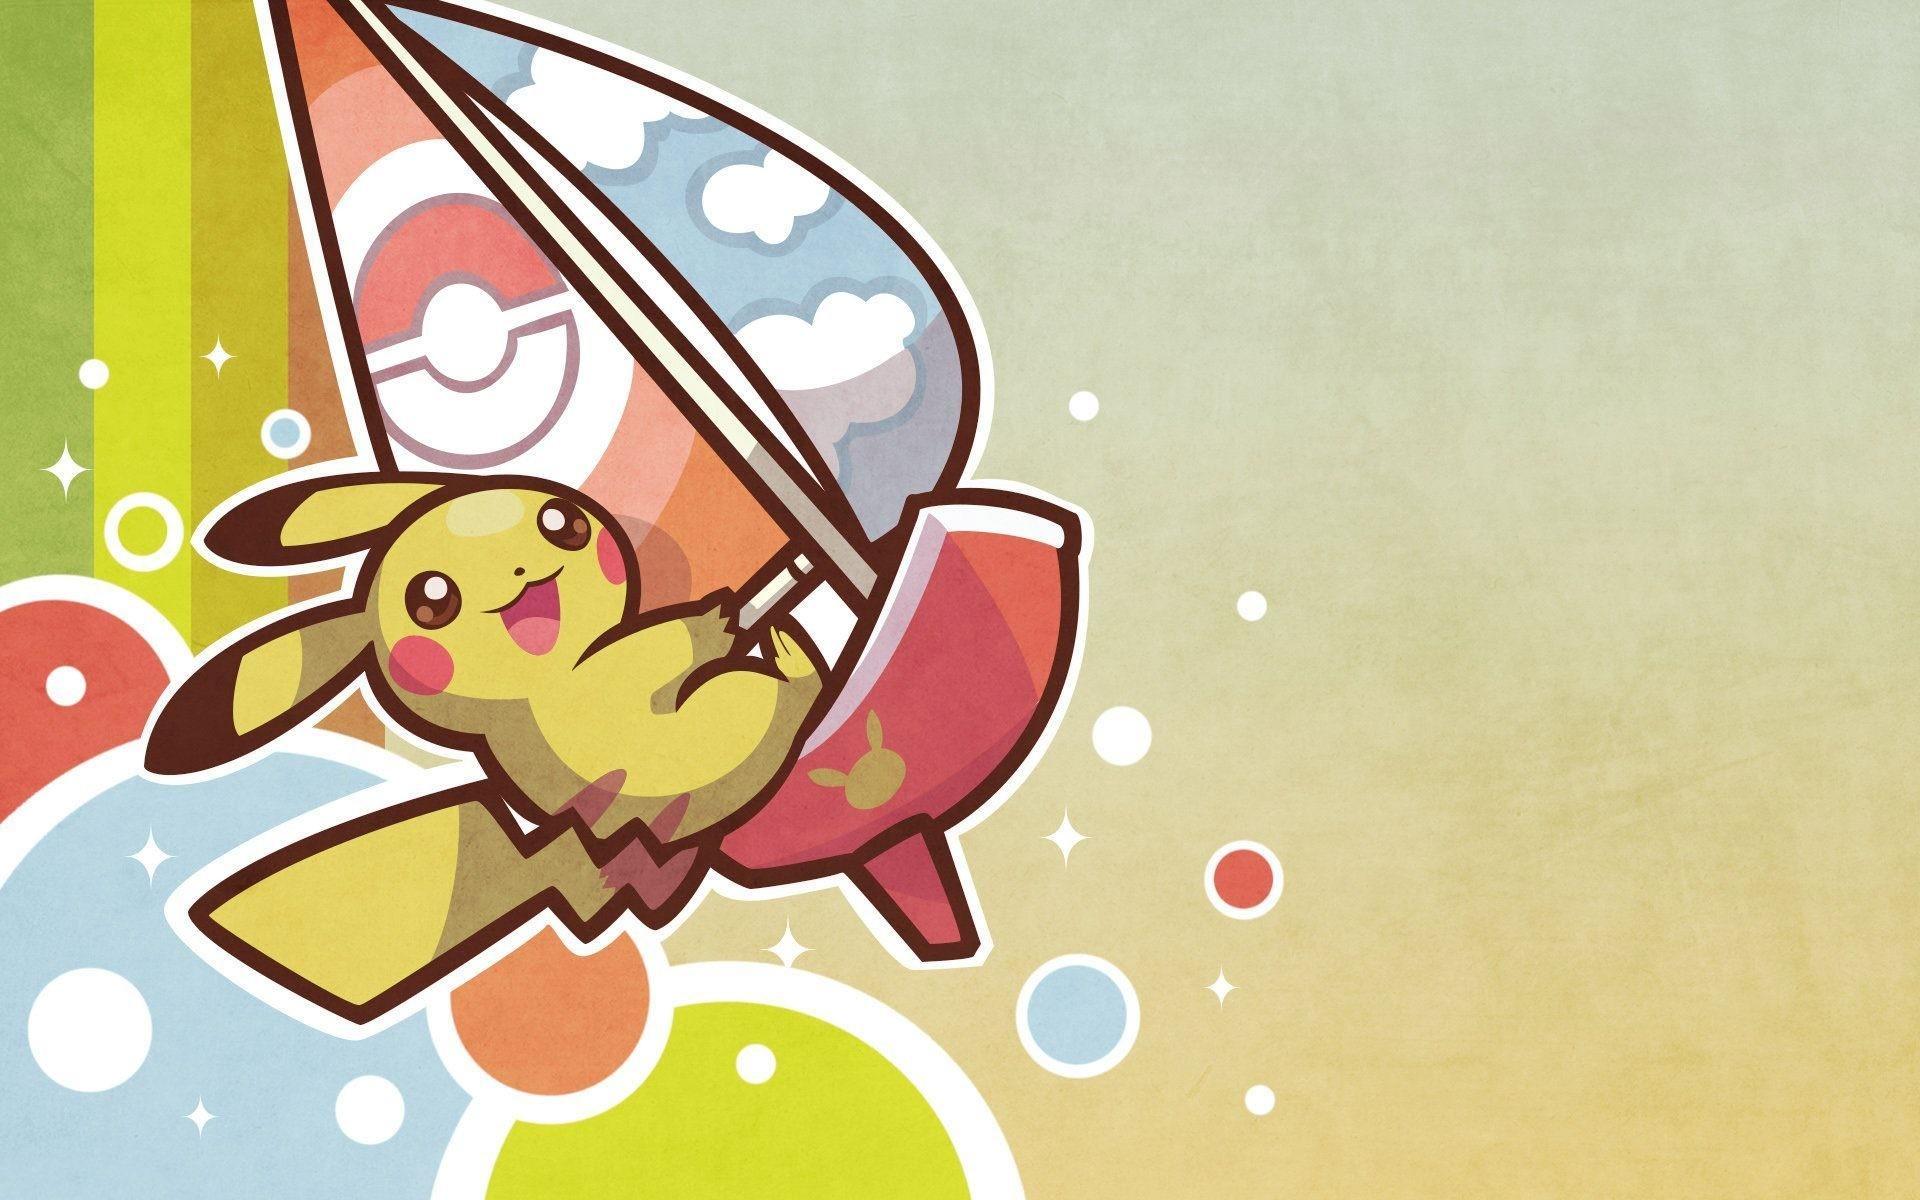 … anime wallpaper hd cute pokemon wallpapers hd resolution at …